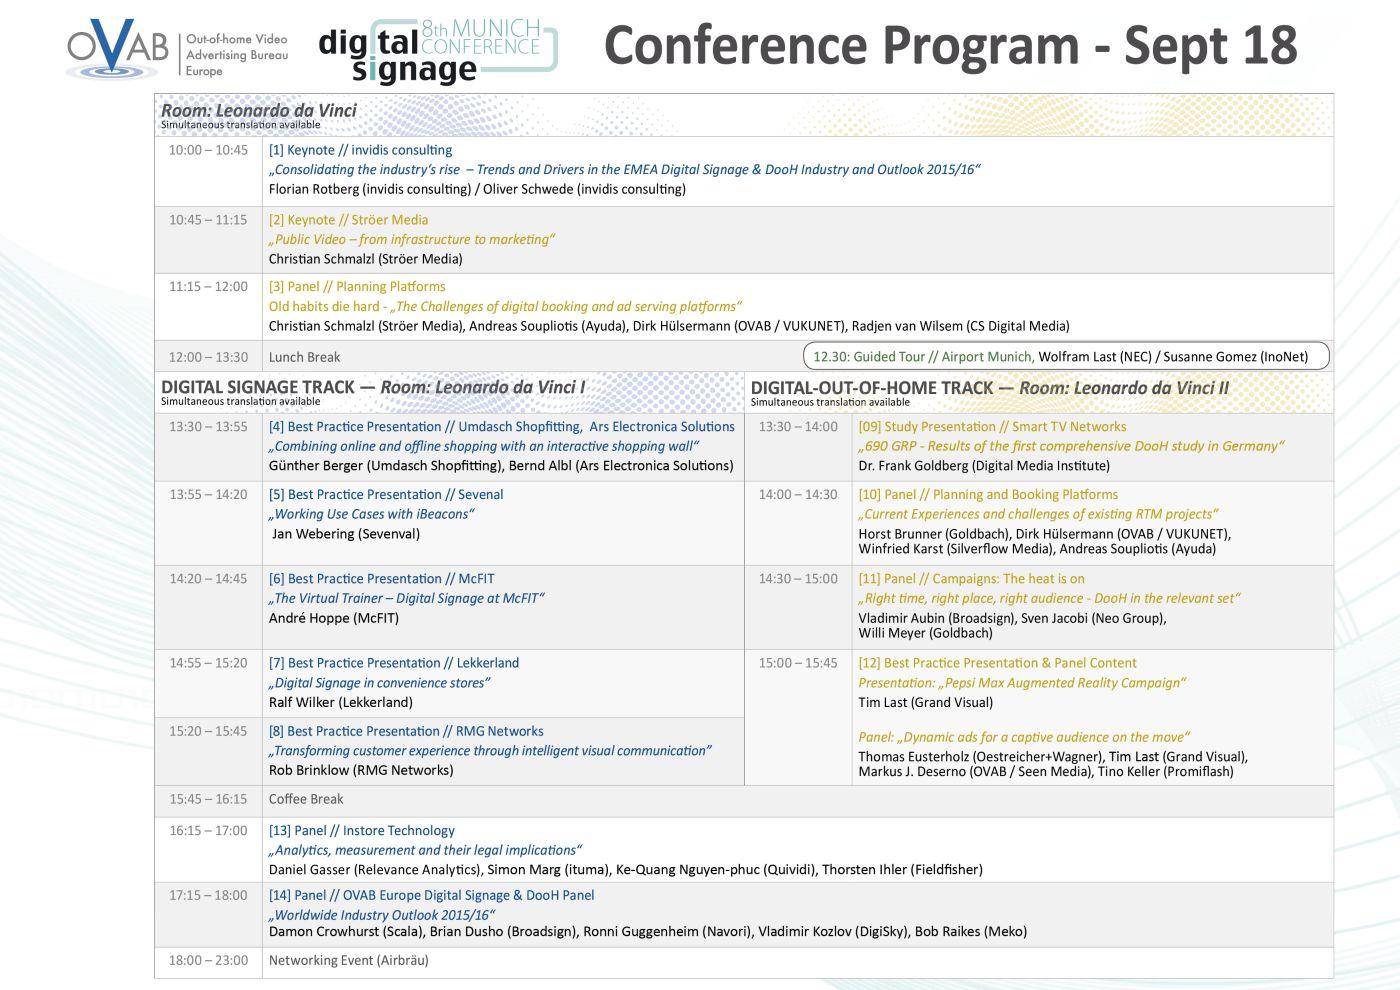 OVAB Digital Signage Conference Munich: Latest version of the conferne programm (Image: invidis)